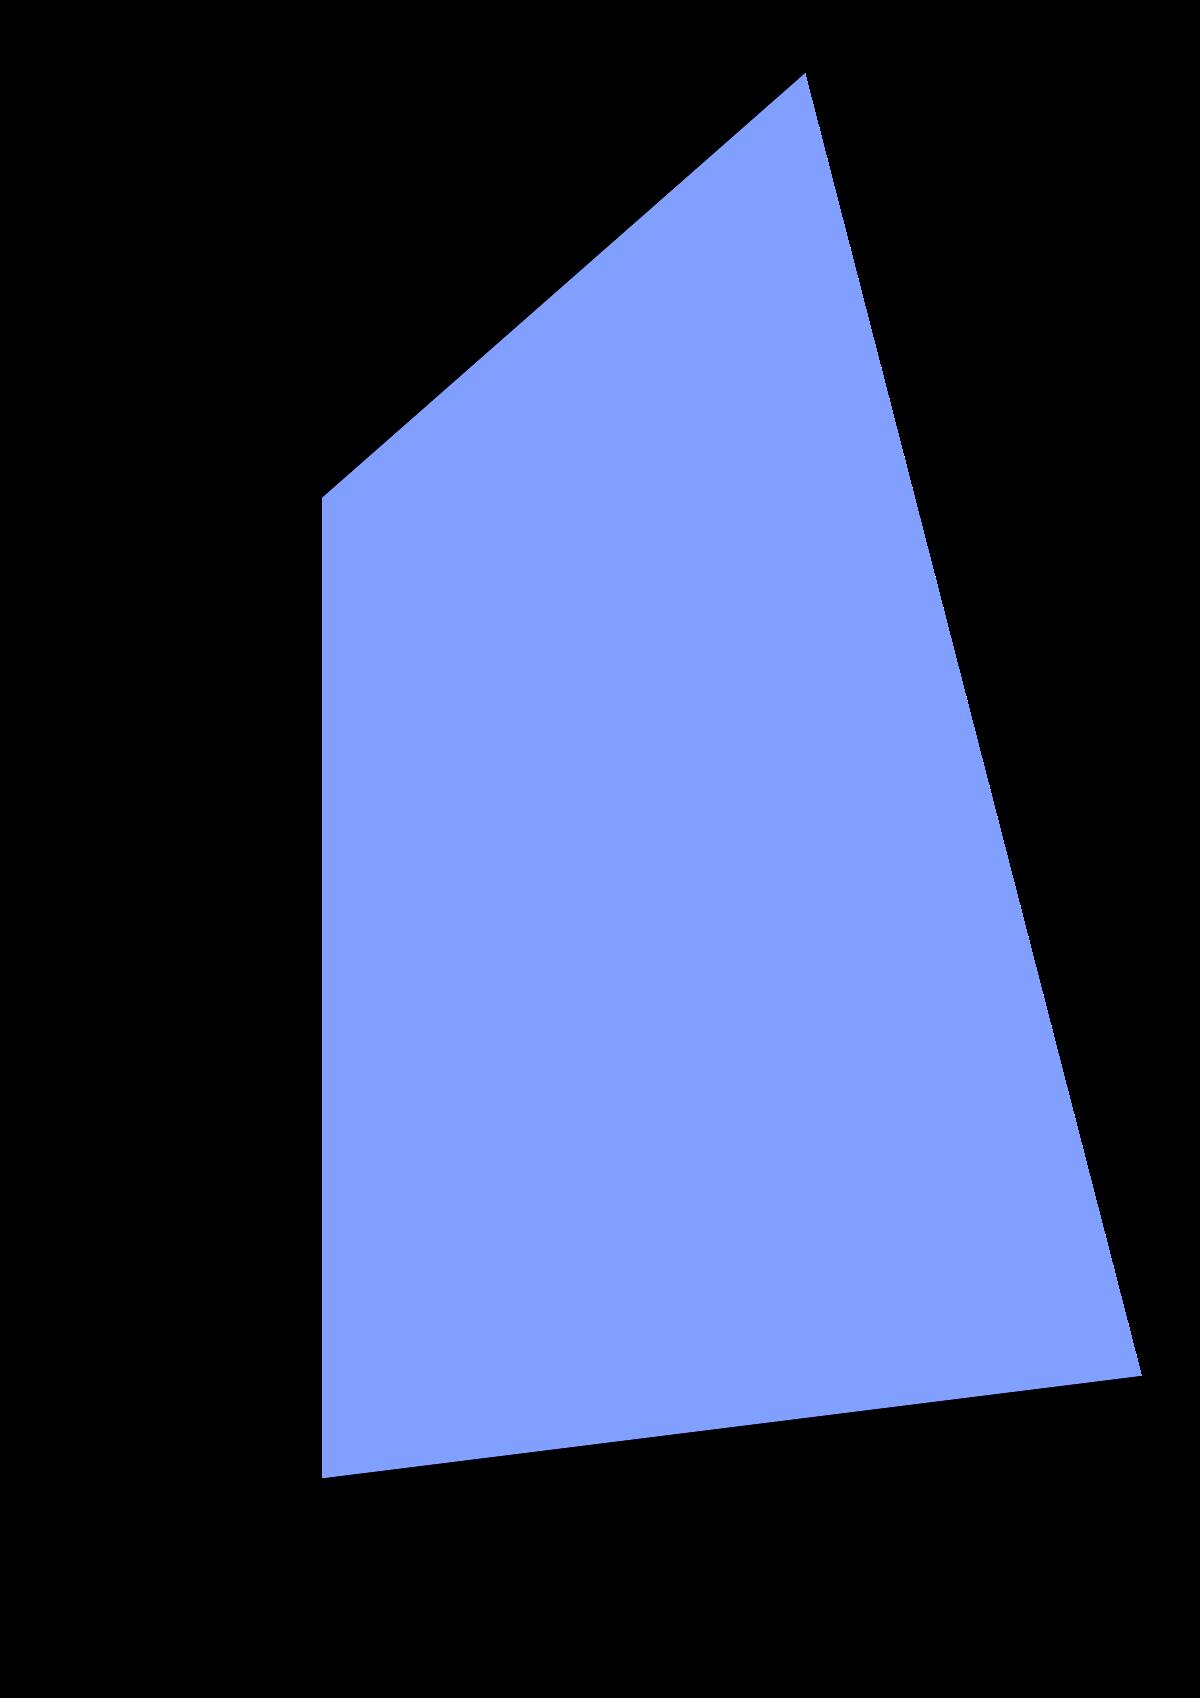 Clipart ocean waterline. Catboat wikipedia